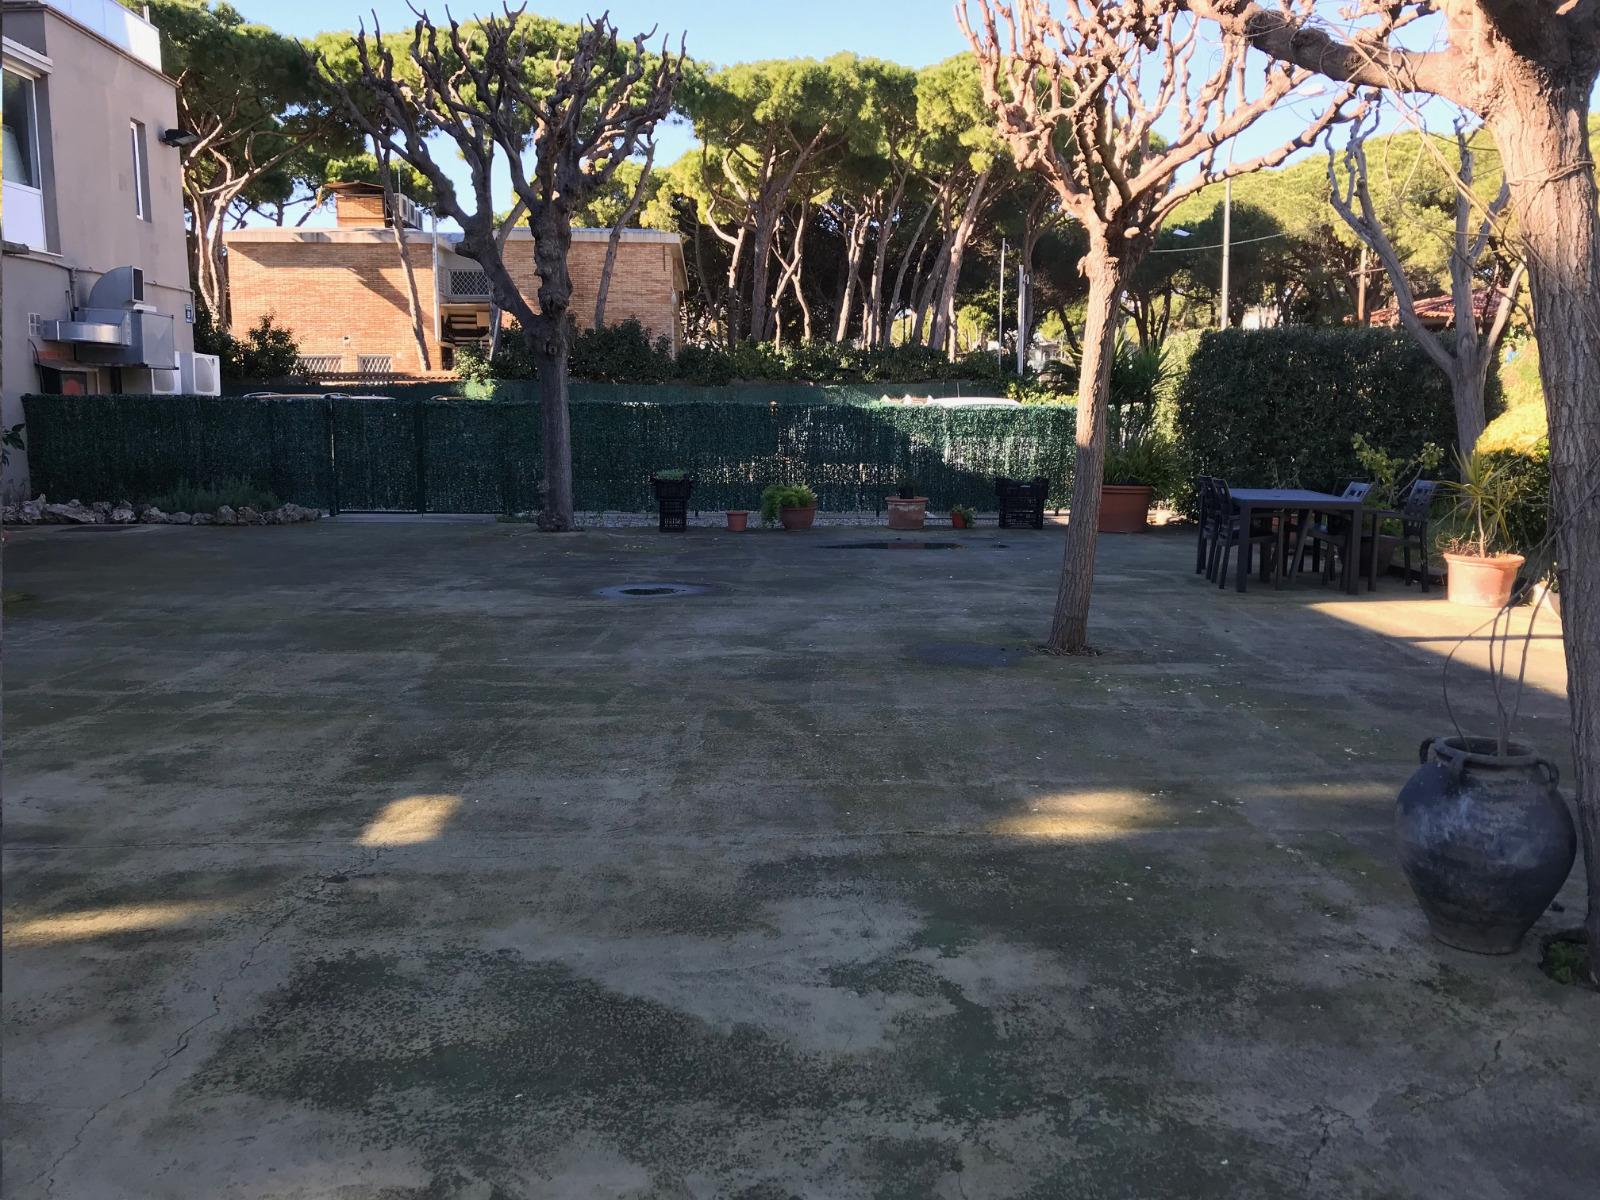 RESIDENCIA 3ª EDAD: Colonias extranjeras – Castelldefels